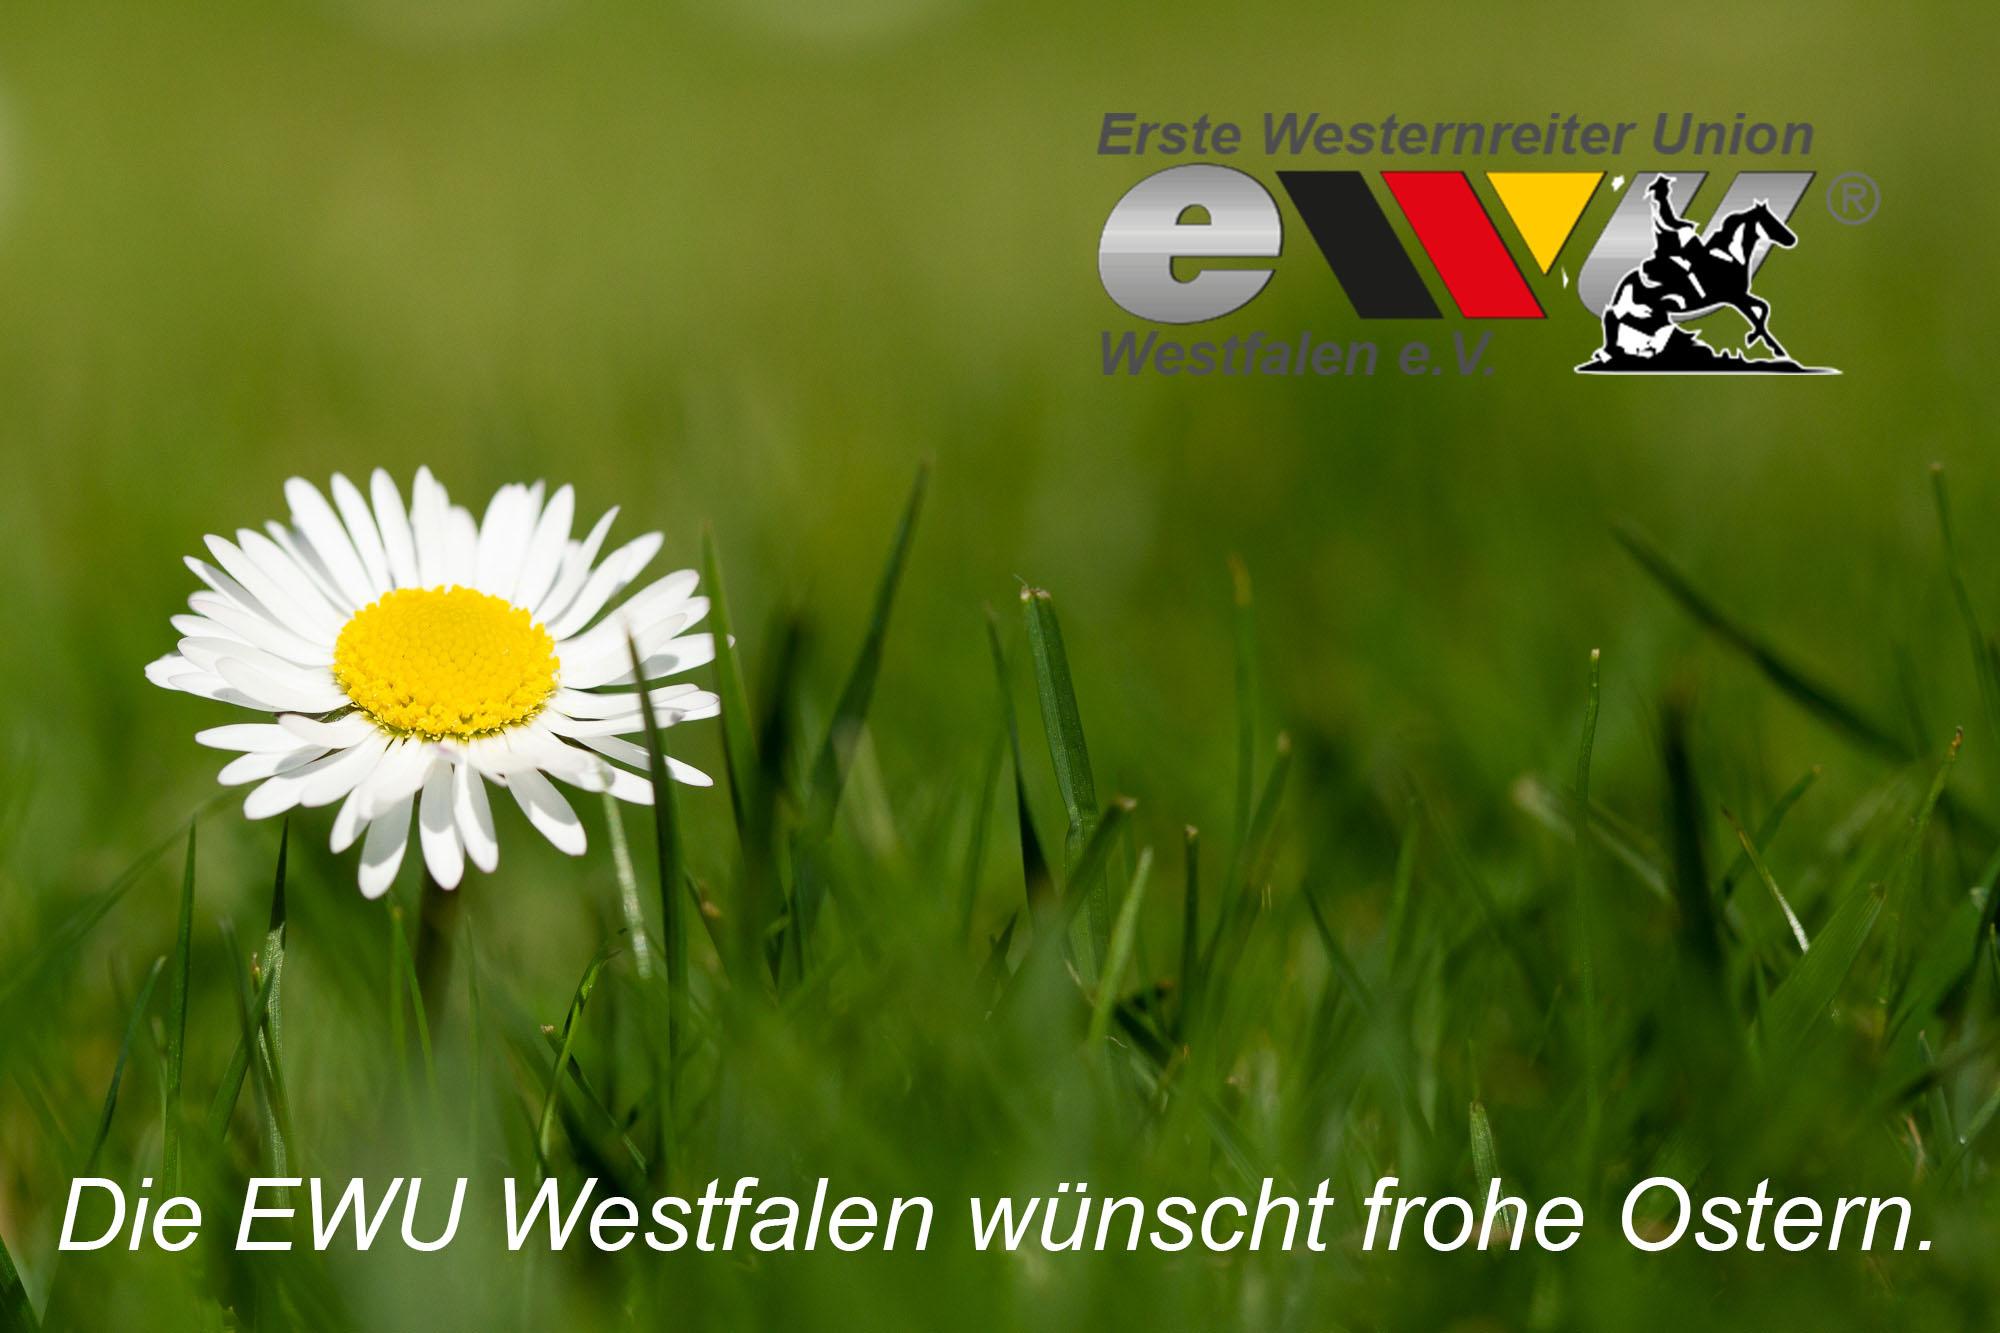 Die EWU Westfalen wünscht frohe Ostern